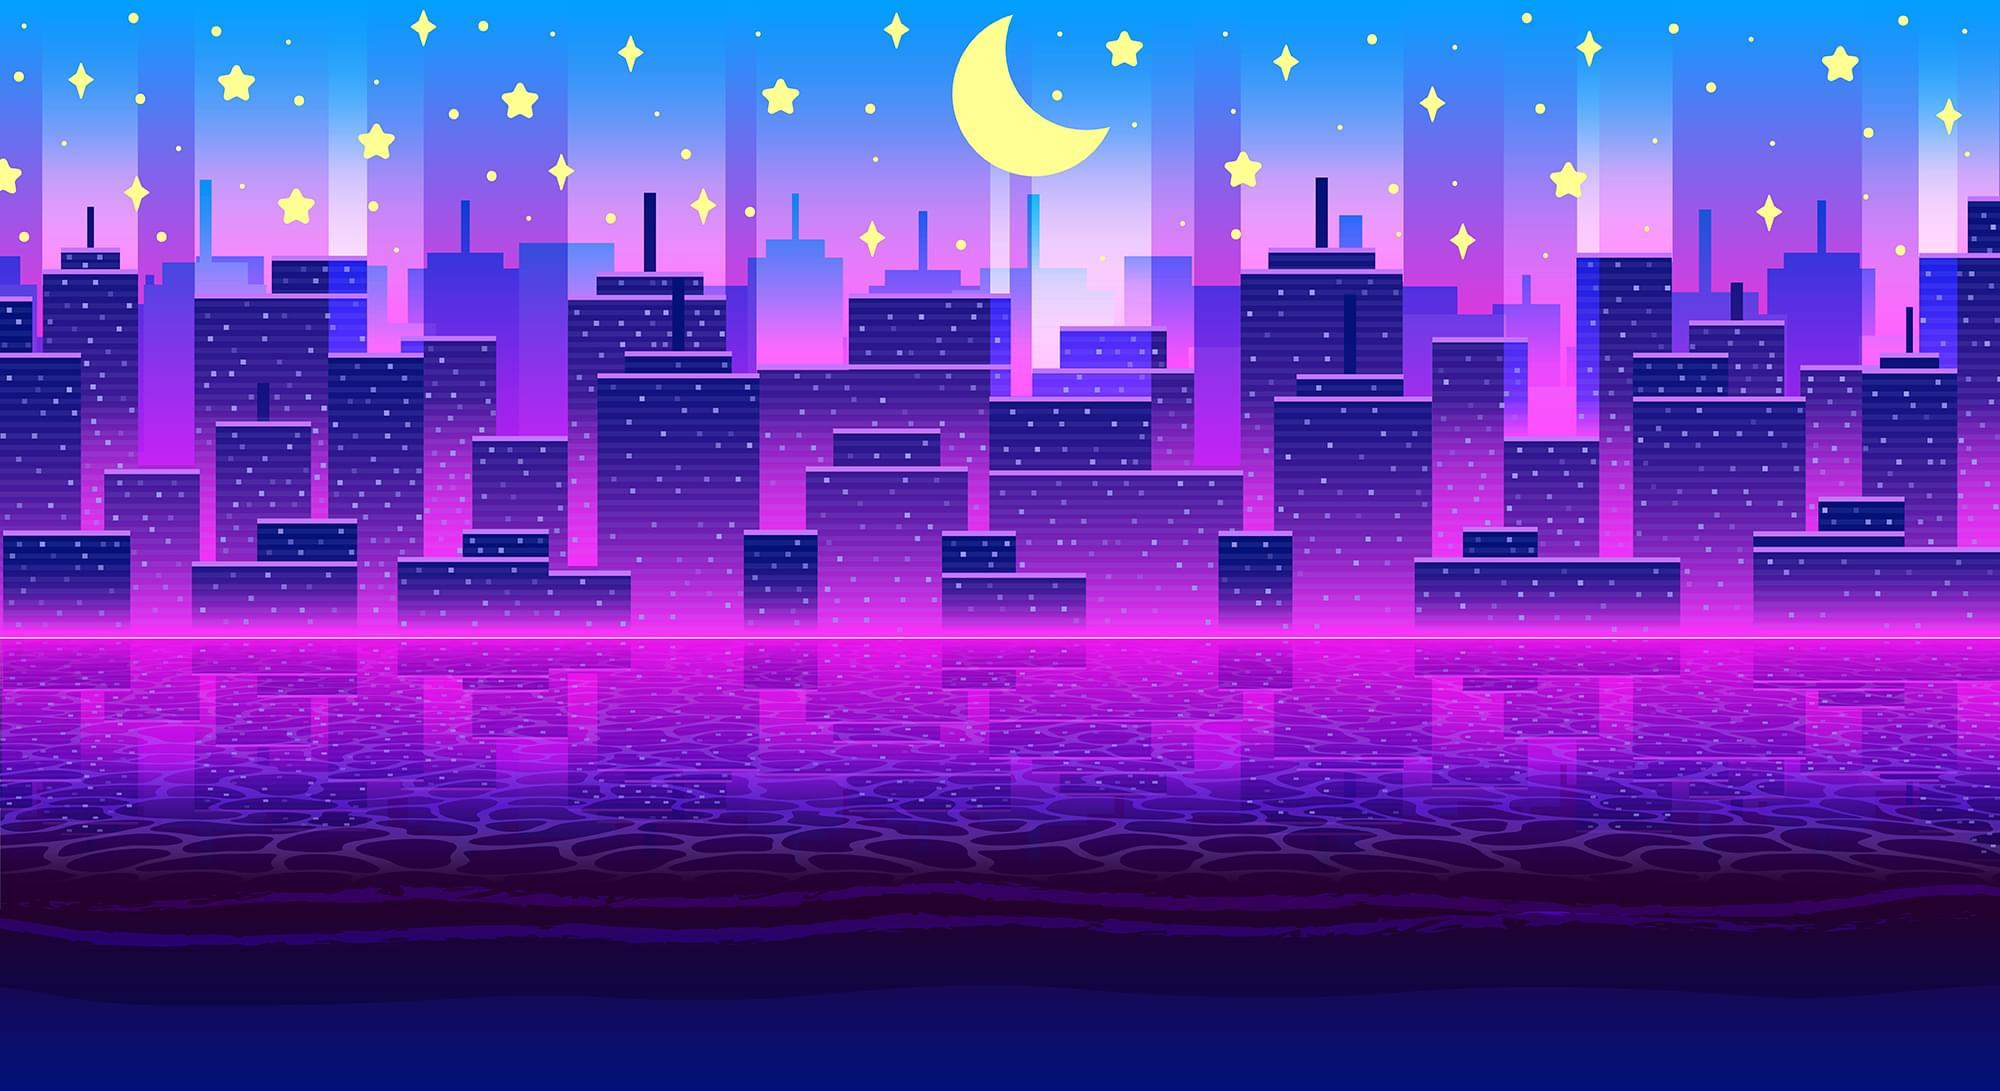 Summer City Landscape